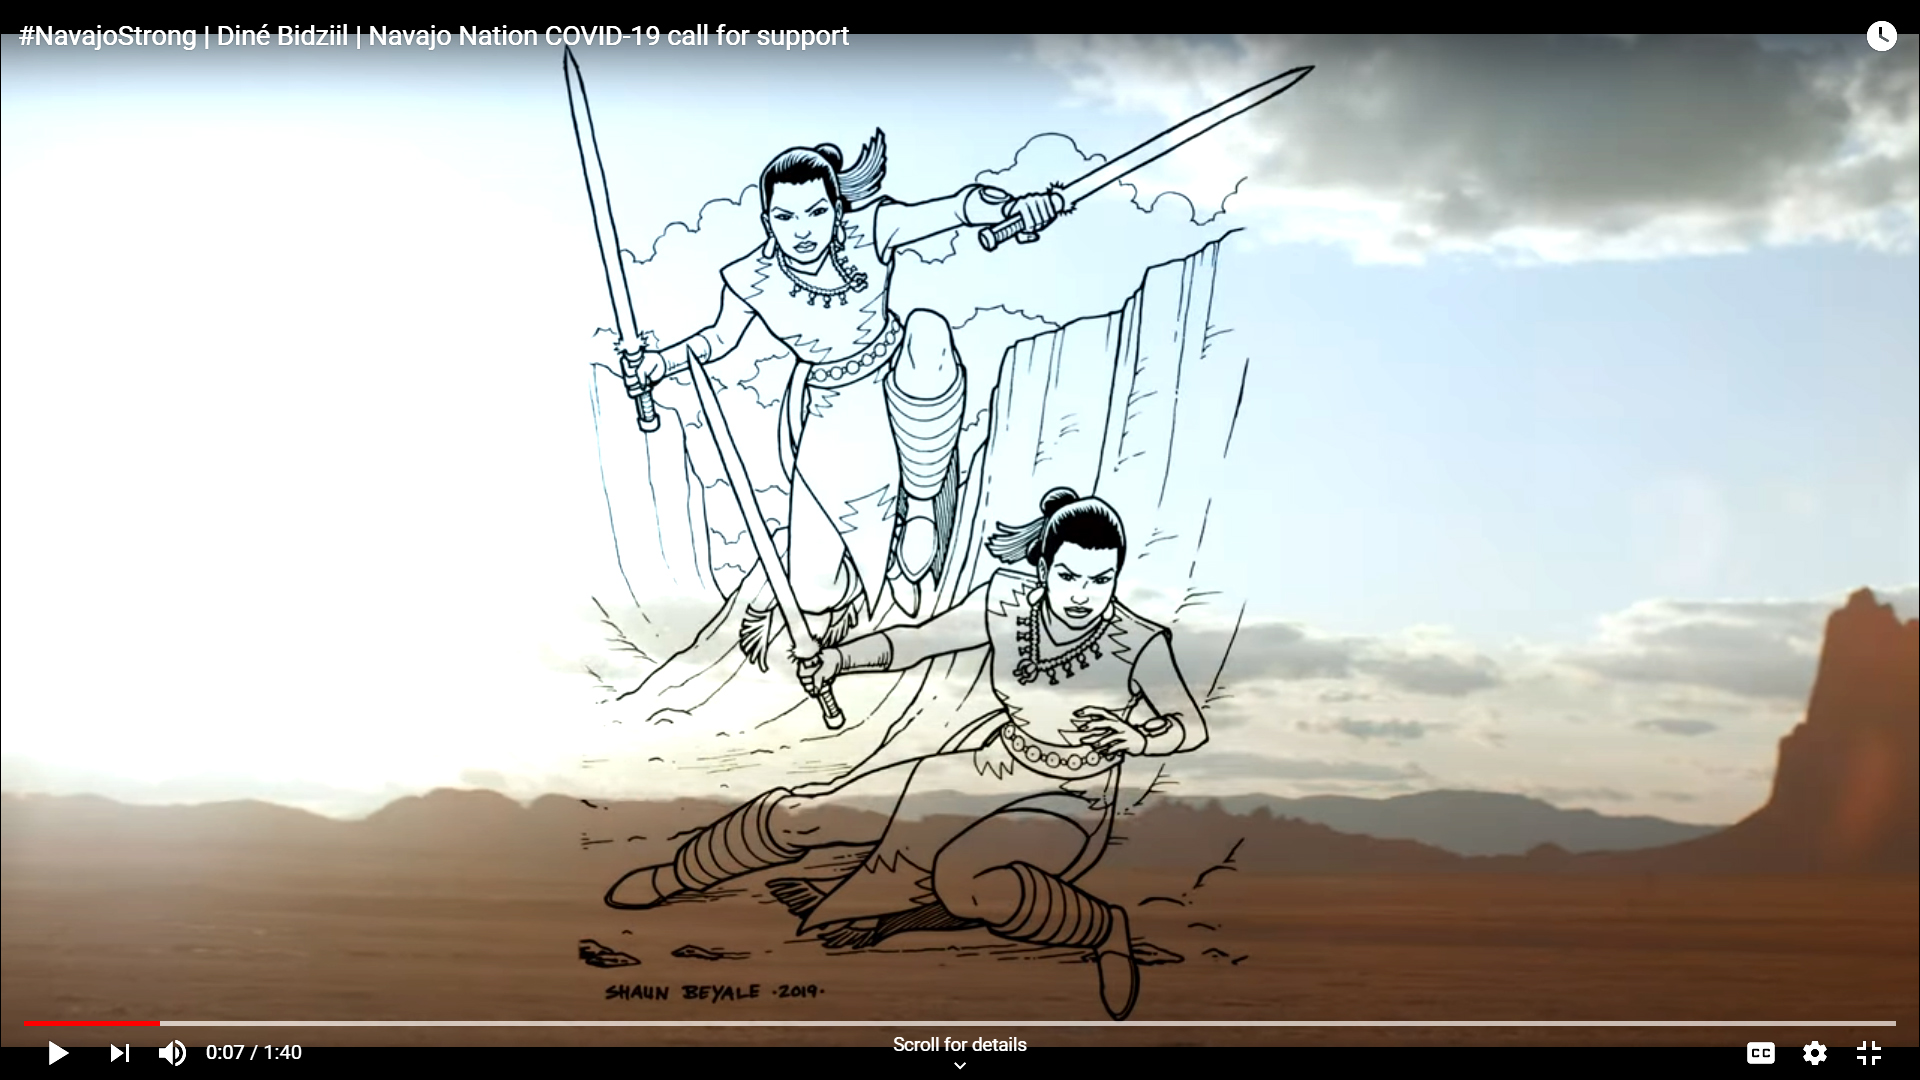 Navajostrong Campaign Launches To Help Fight Covid 19 On Nation Navajo Hopi Observer Navajo Hopi Nations Az